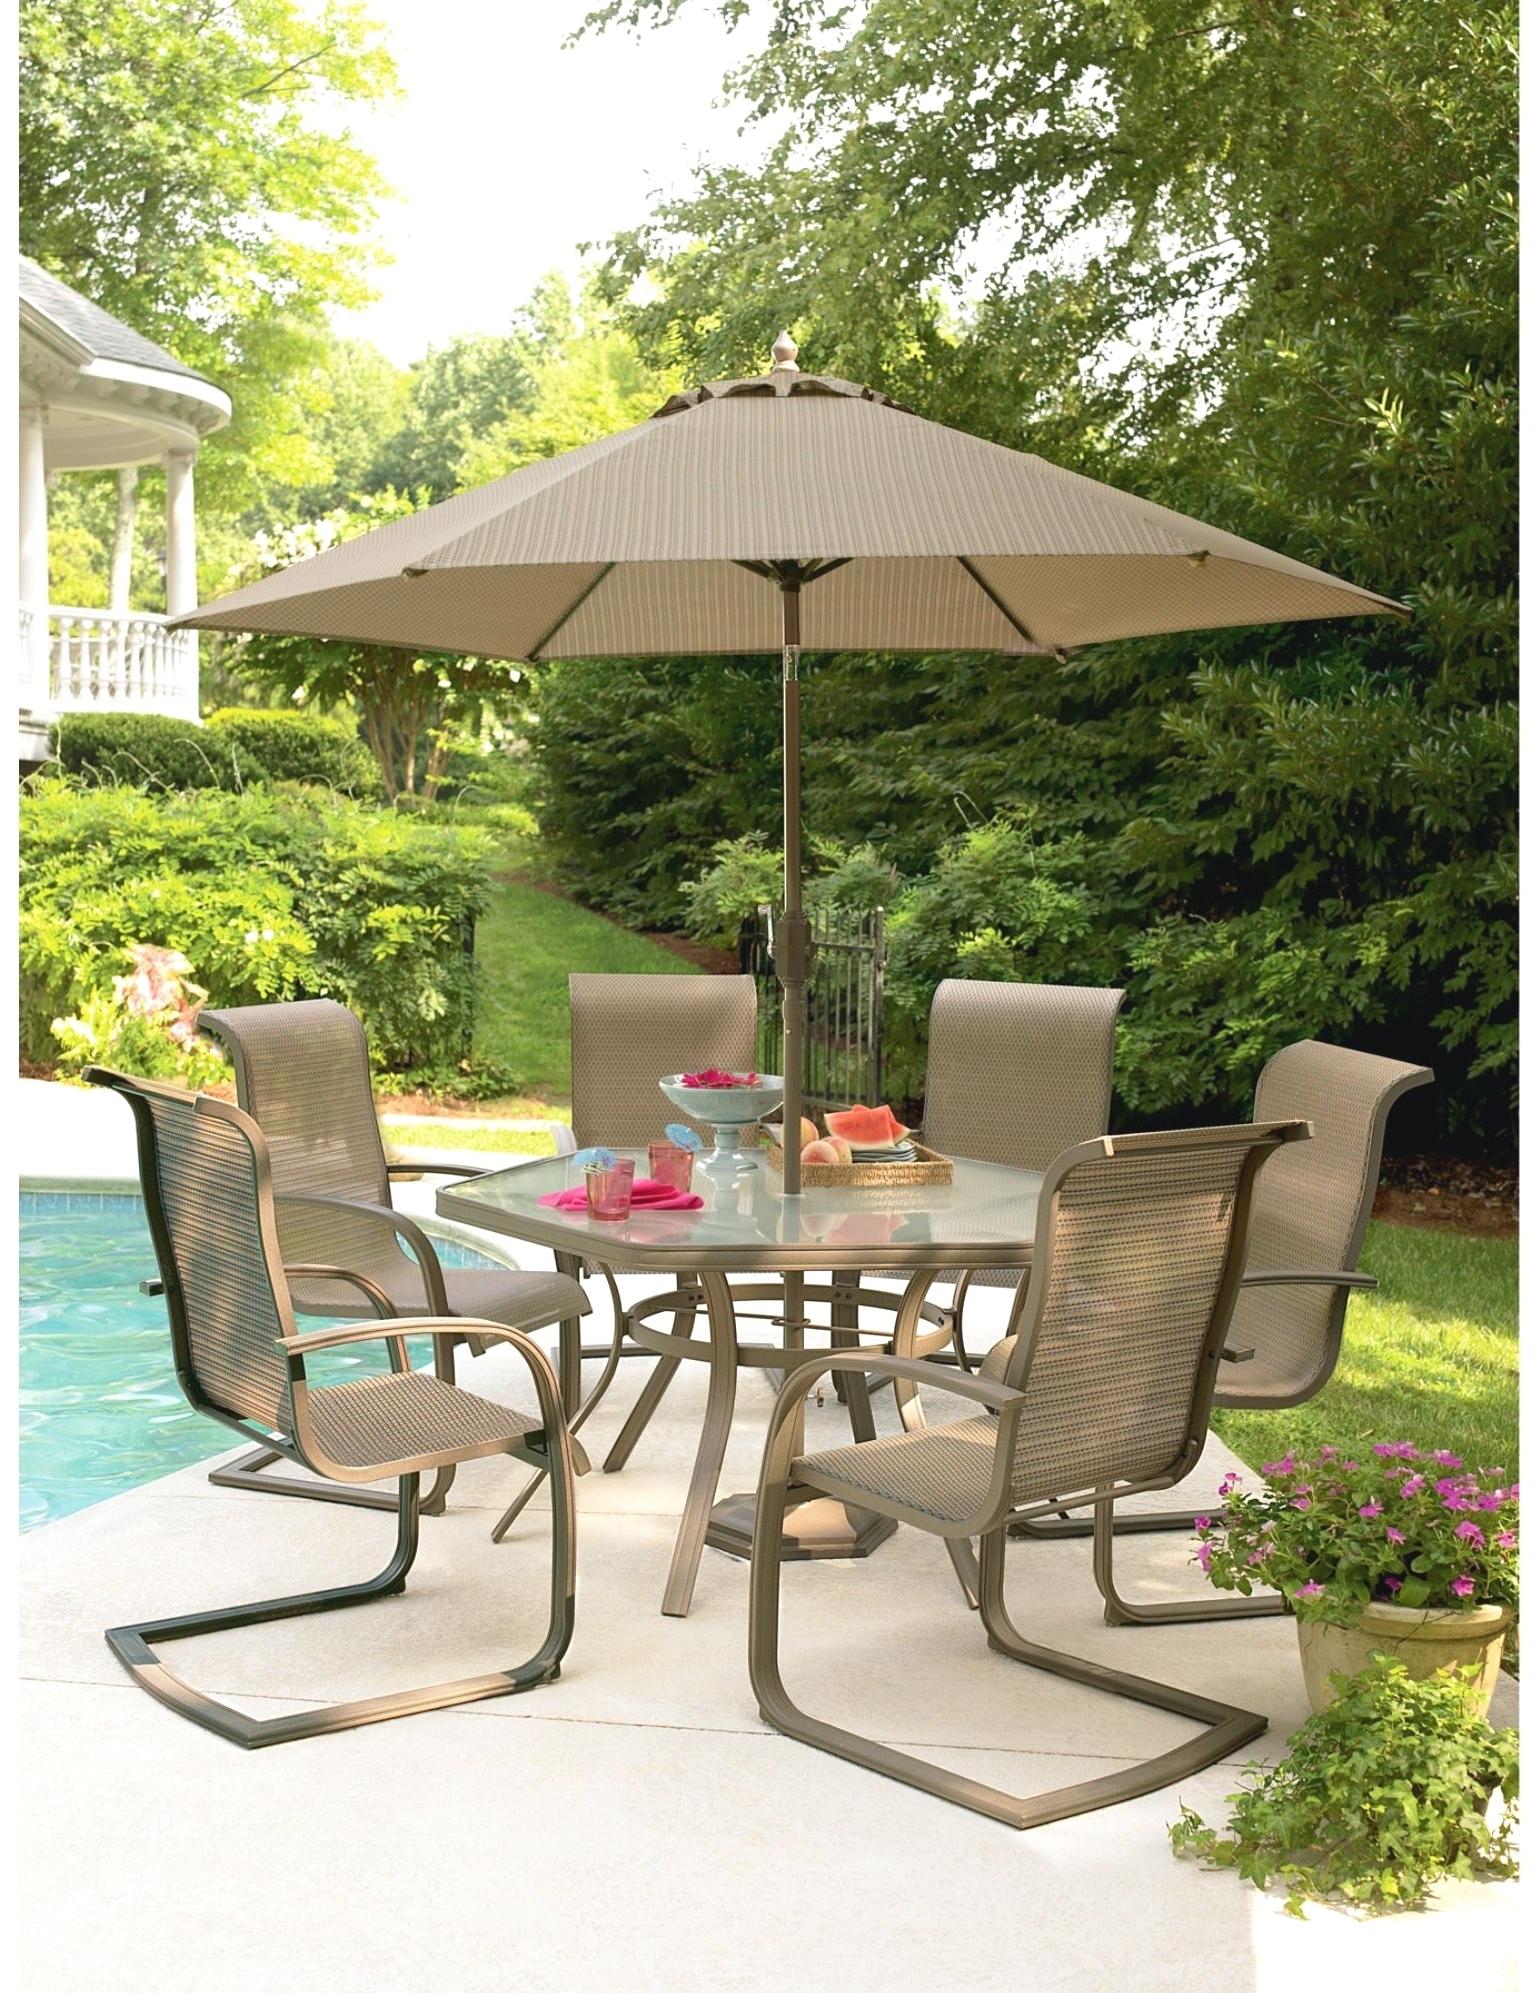 2018 Kmart Conversation Sets Patio Patios Umbrellas Fornspiring Outdoor In Martha Stewart Conversation Patio Sets (View 2 of 15)